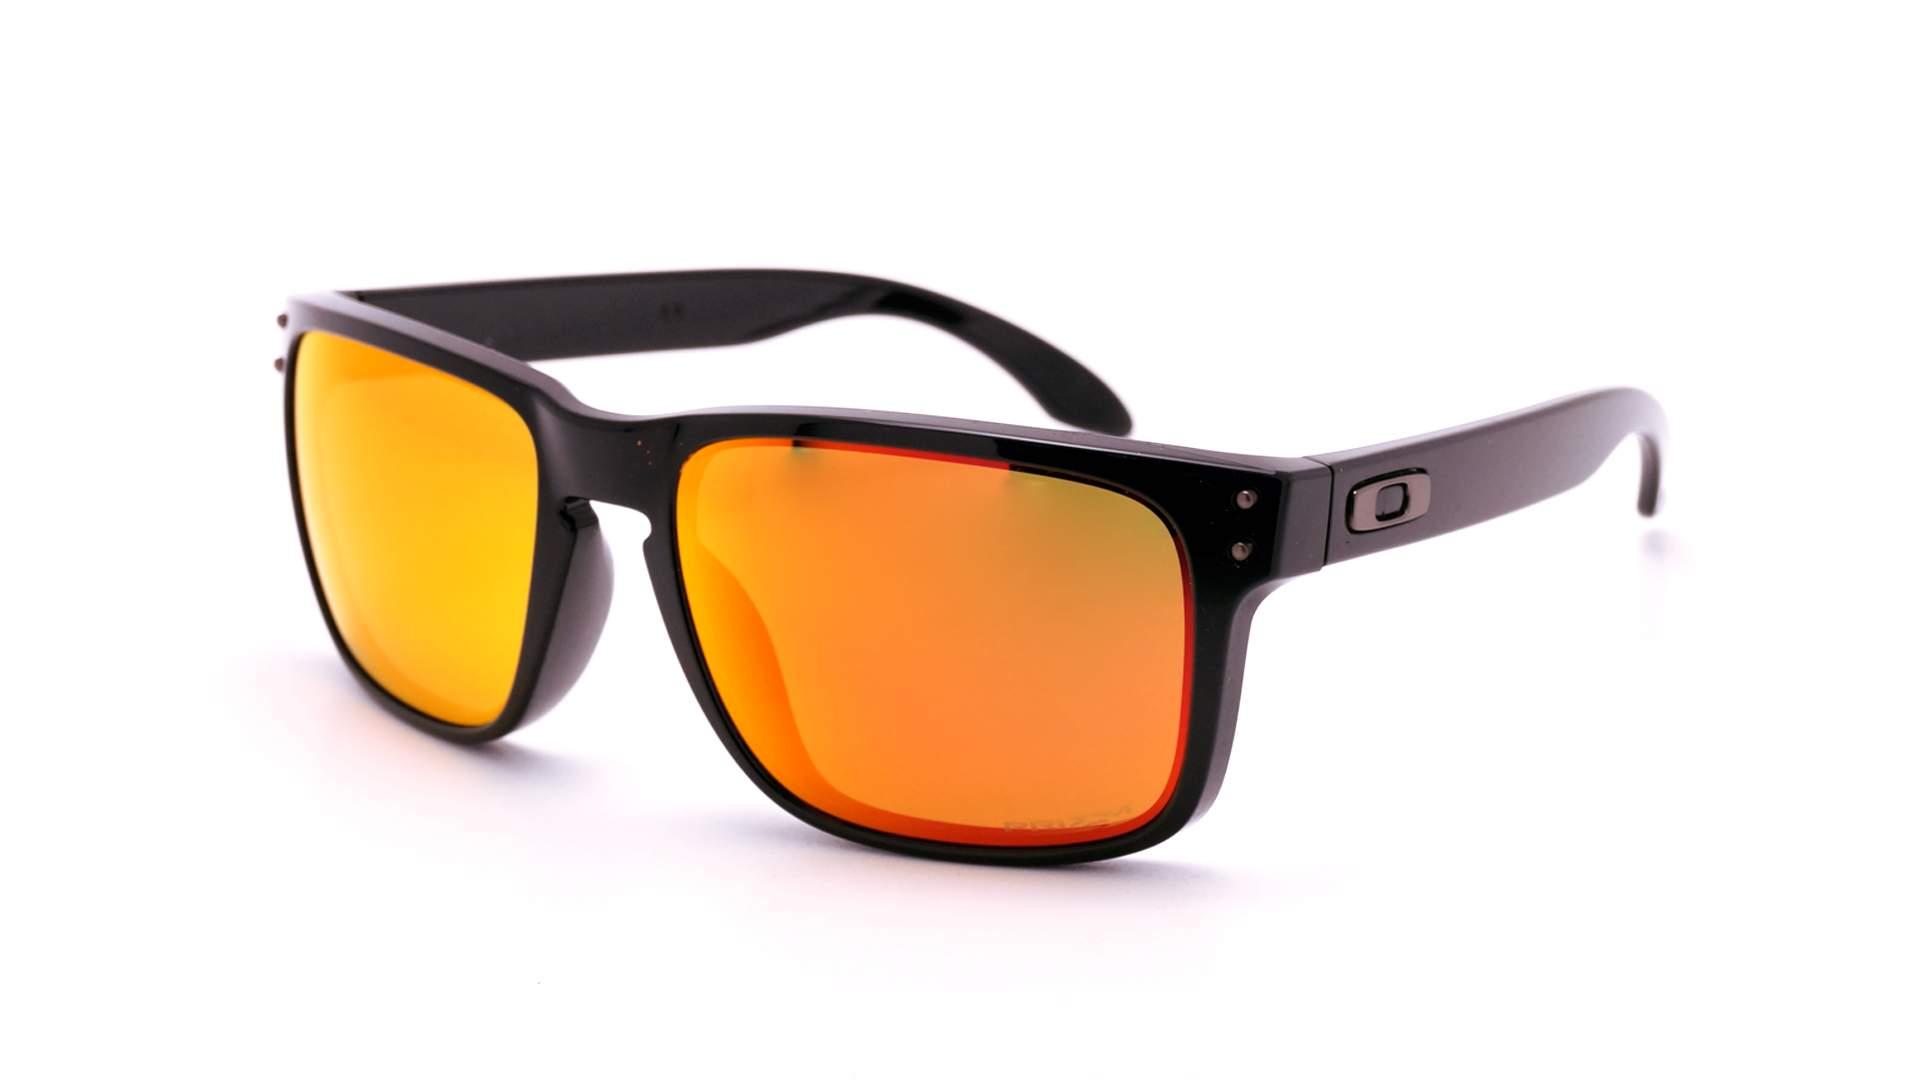 55ed1baf56 Sunglasses Oakley Holbrook Black Prizm OO9102 F1 55-18 Medium Polarized  Mirror